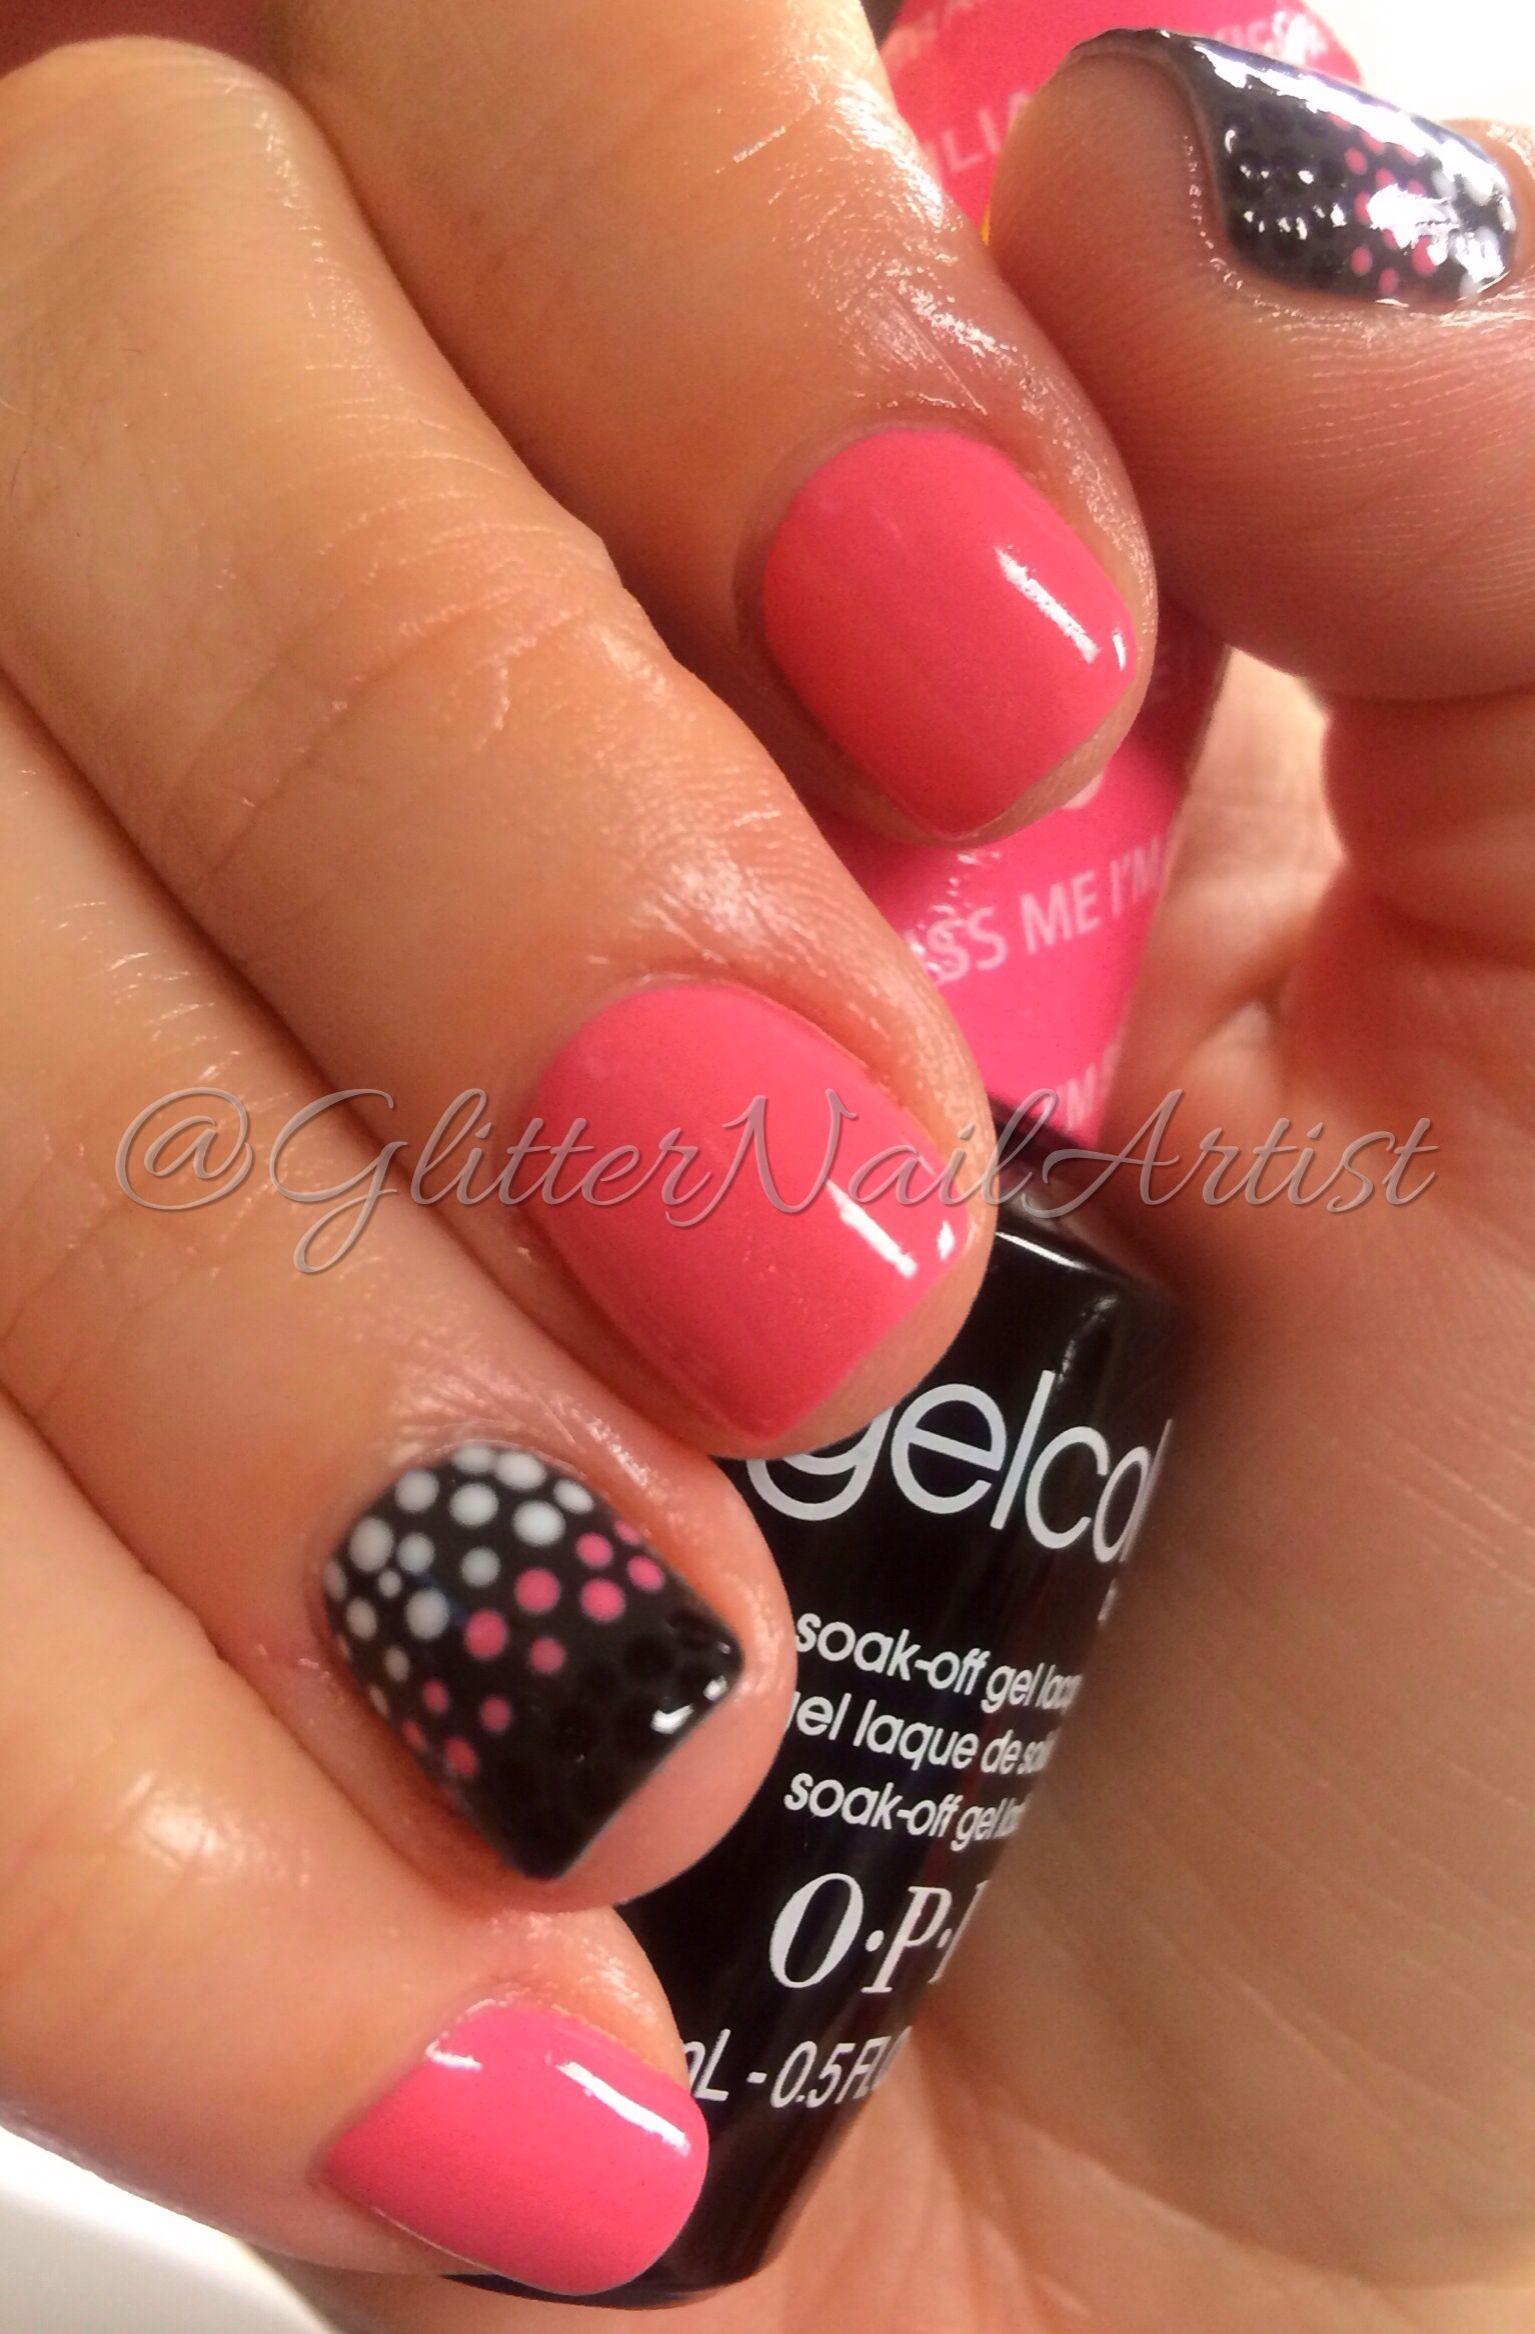 Glitternailartist Bright Pink Nails Polka Dots Fun Summer Nails